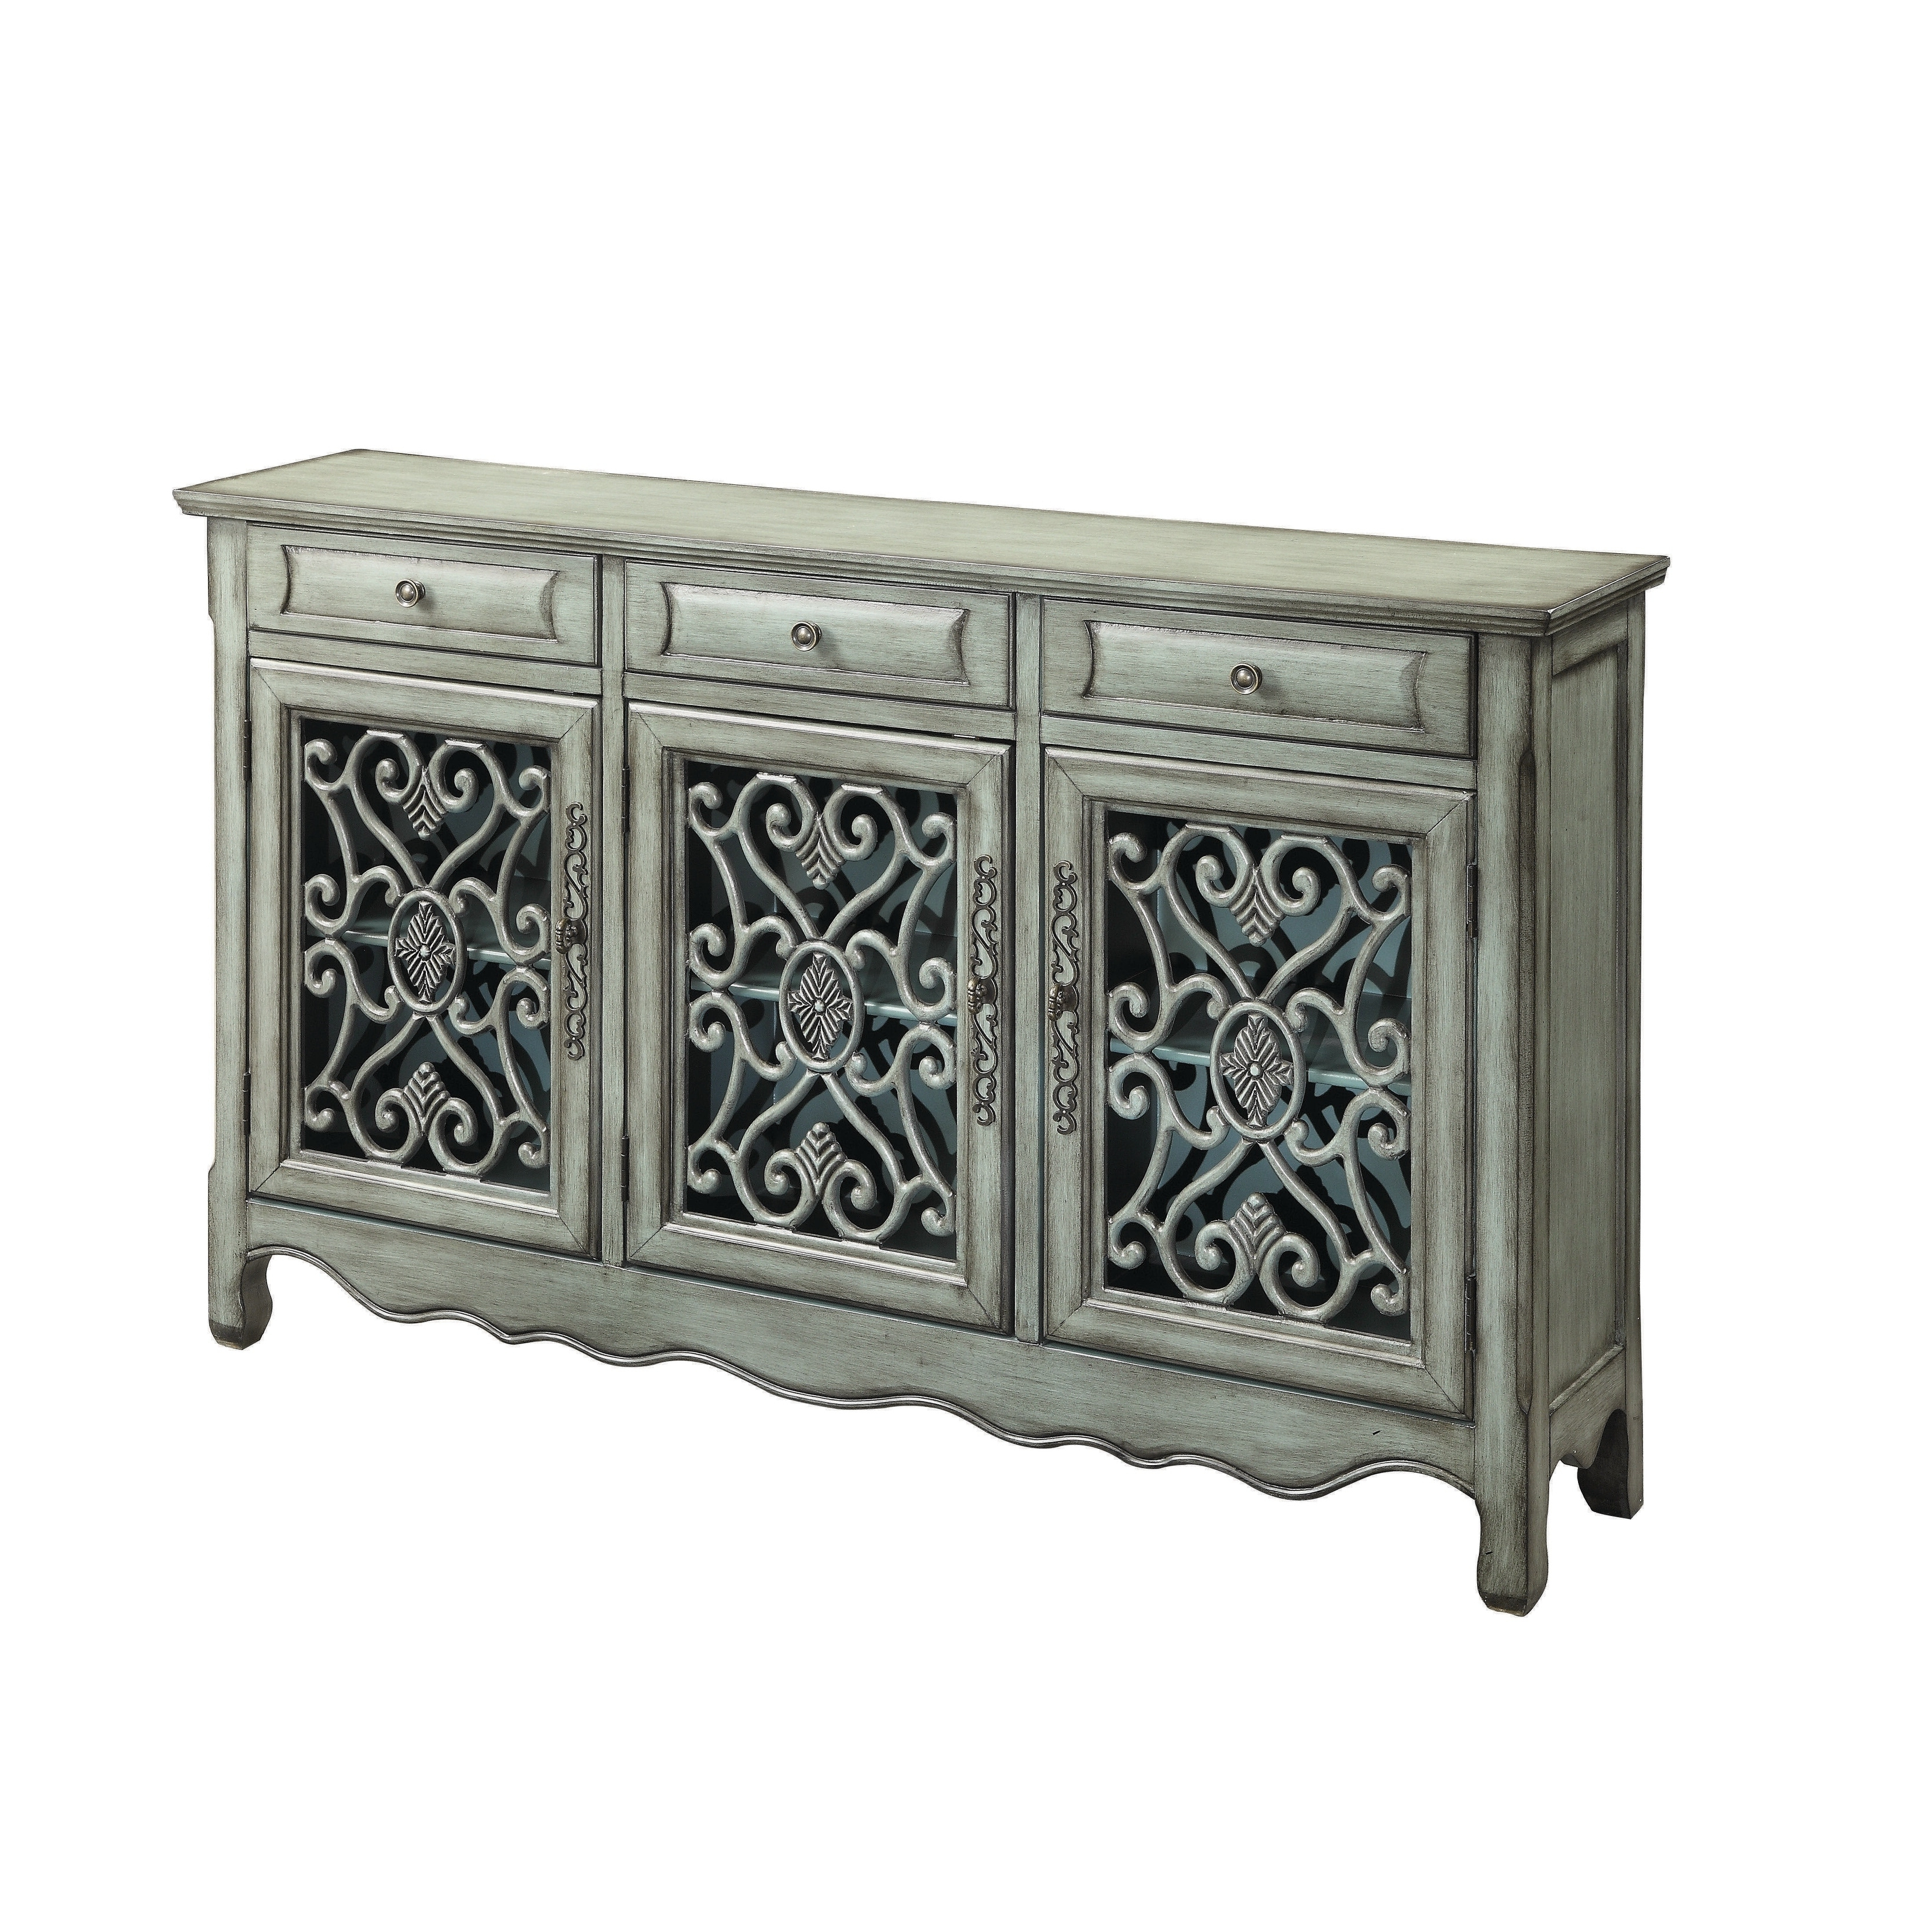 Traditional Antique Green 3 Door Cabinet, Clear, Coaster In Regarding Shoreland Sideboards (View 18 of 20)